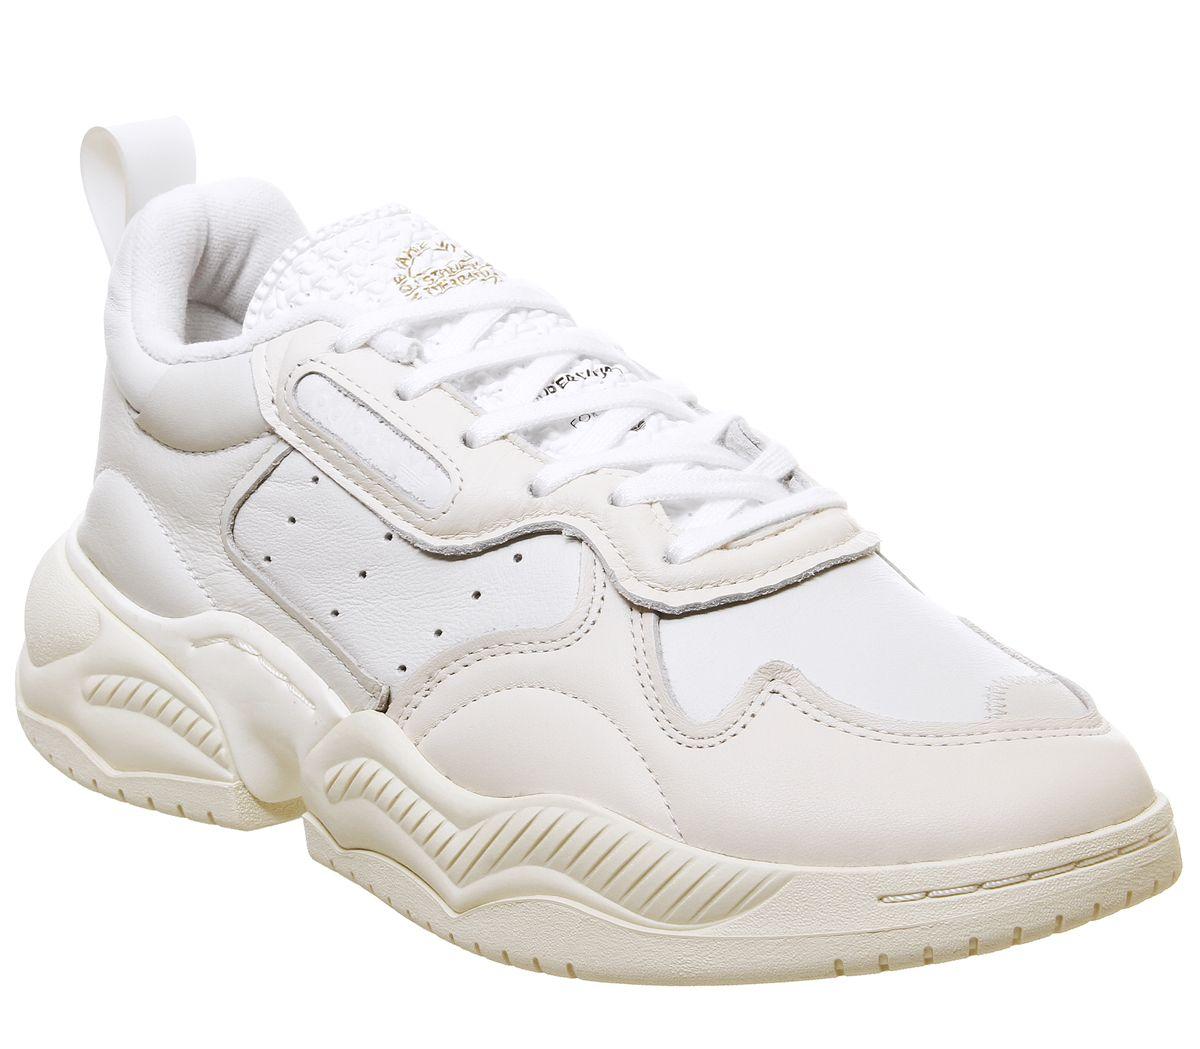 Adidas Supercourt 90s